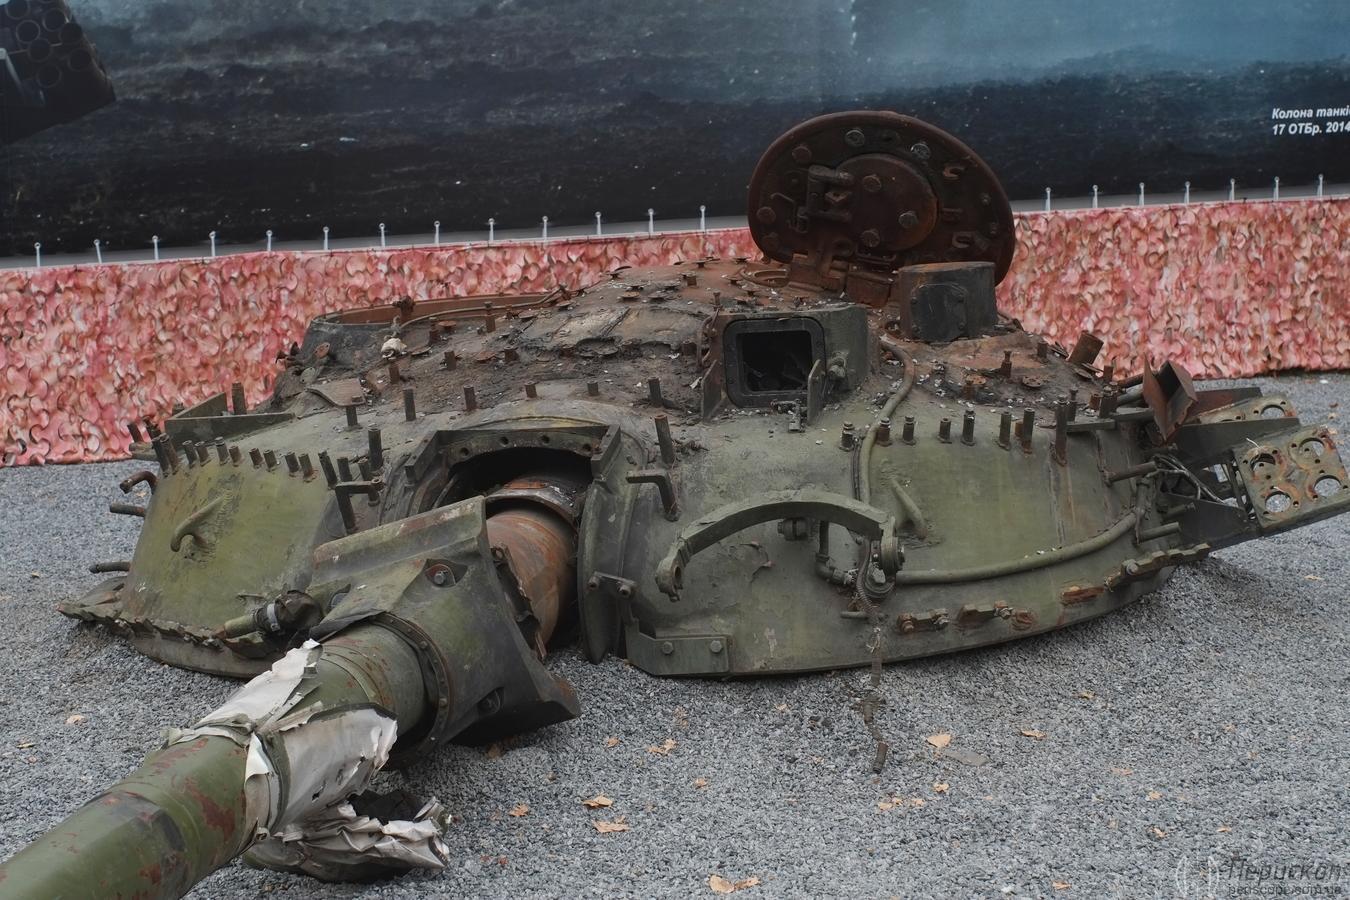 башня танка картинки зеленые скульптуры, созданные